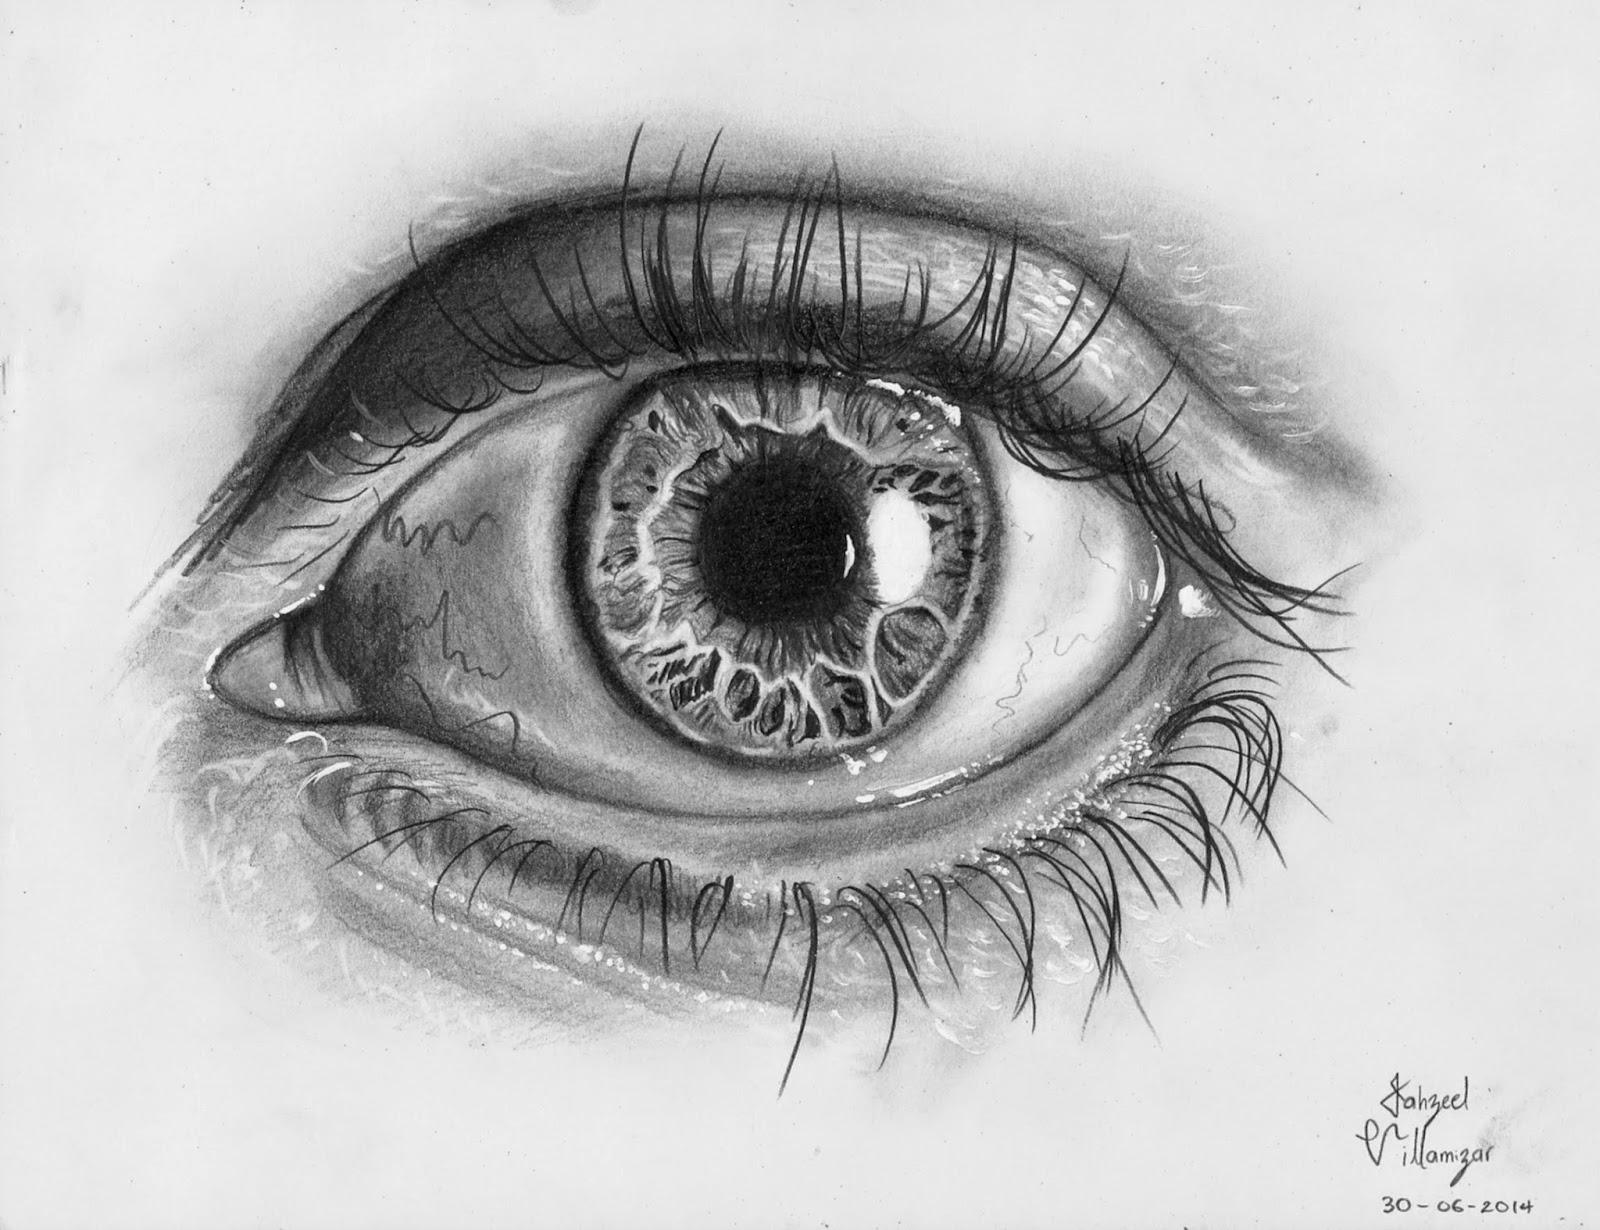 como ojo dibujar un paso a paso realista en lapiz y papel como pintar un ojo de verdad dibujar ojo reais